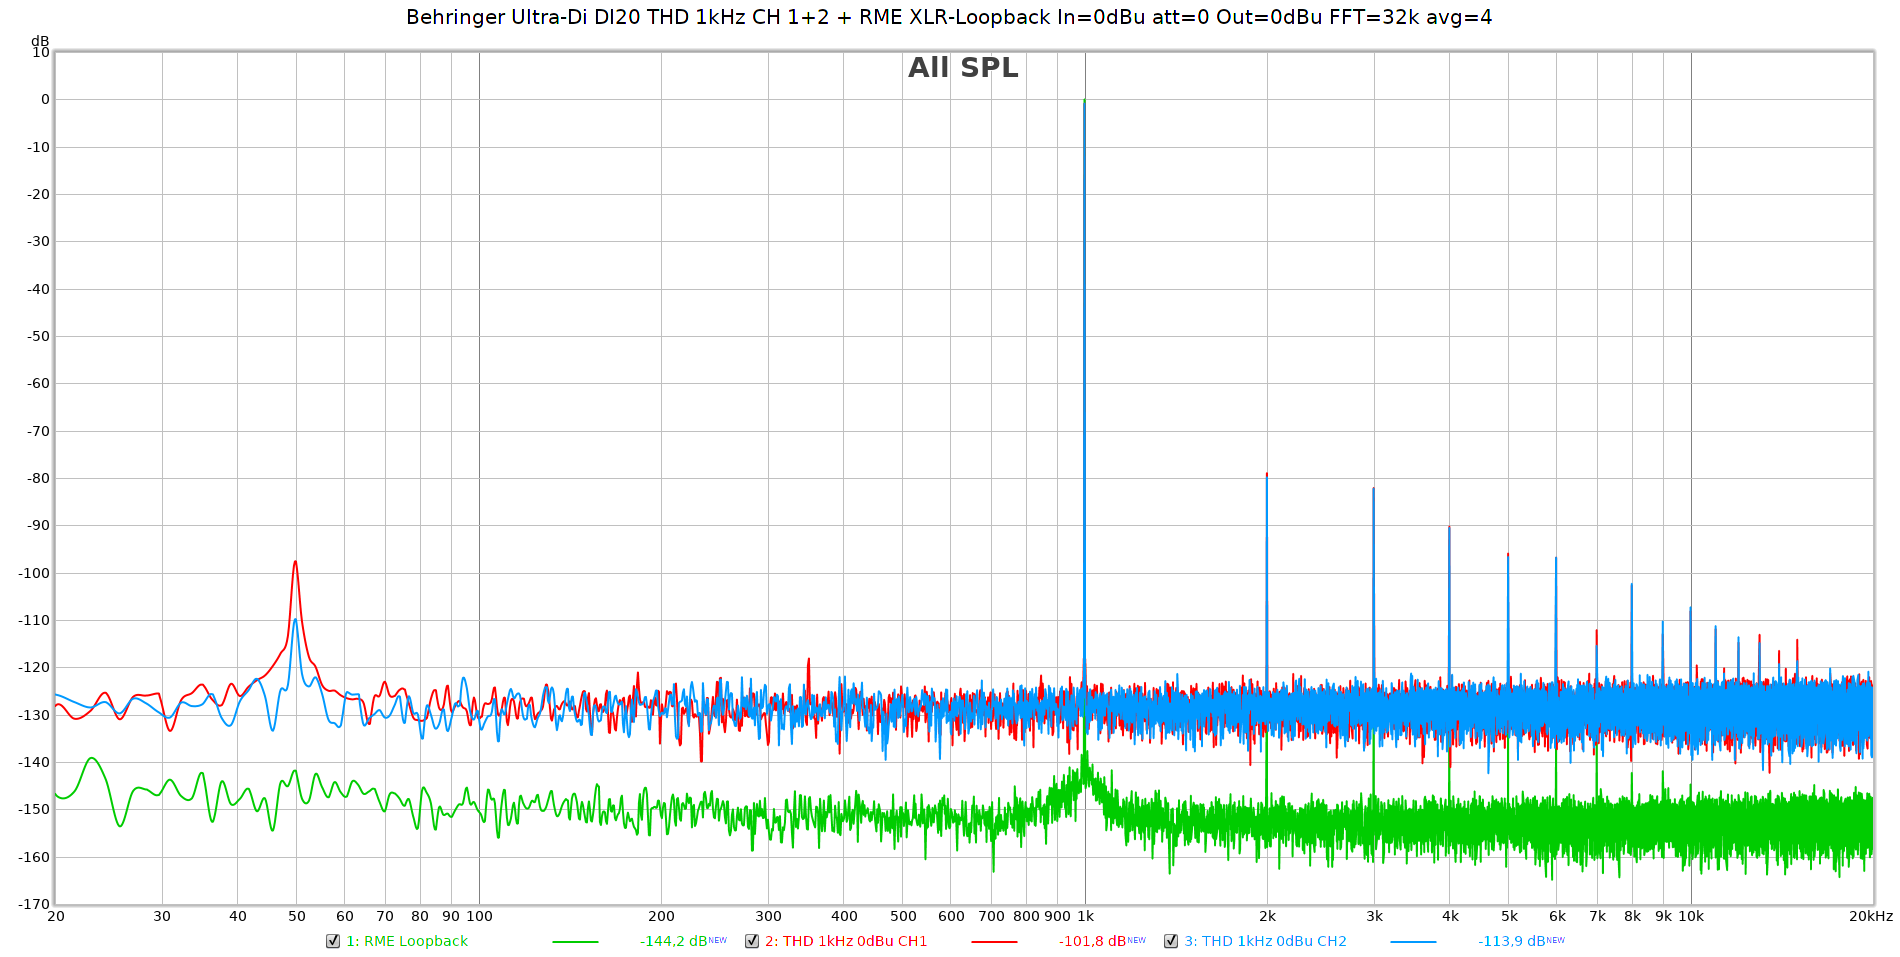 Behringer Ultra-Di DI20 THD 1kHz CH 1+2 + RME XLR-Loopback In=0dBu att=0 Out=0dBu FFT=32k avg=4.png